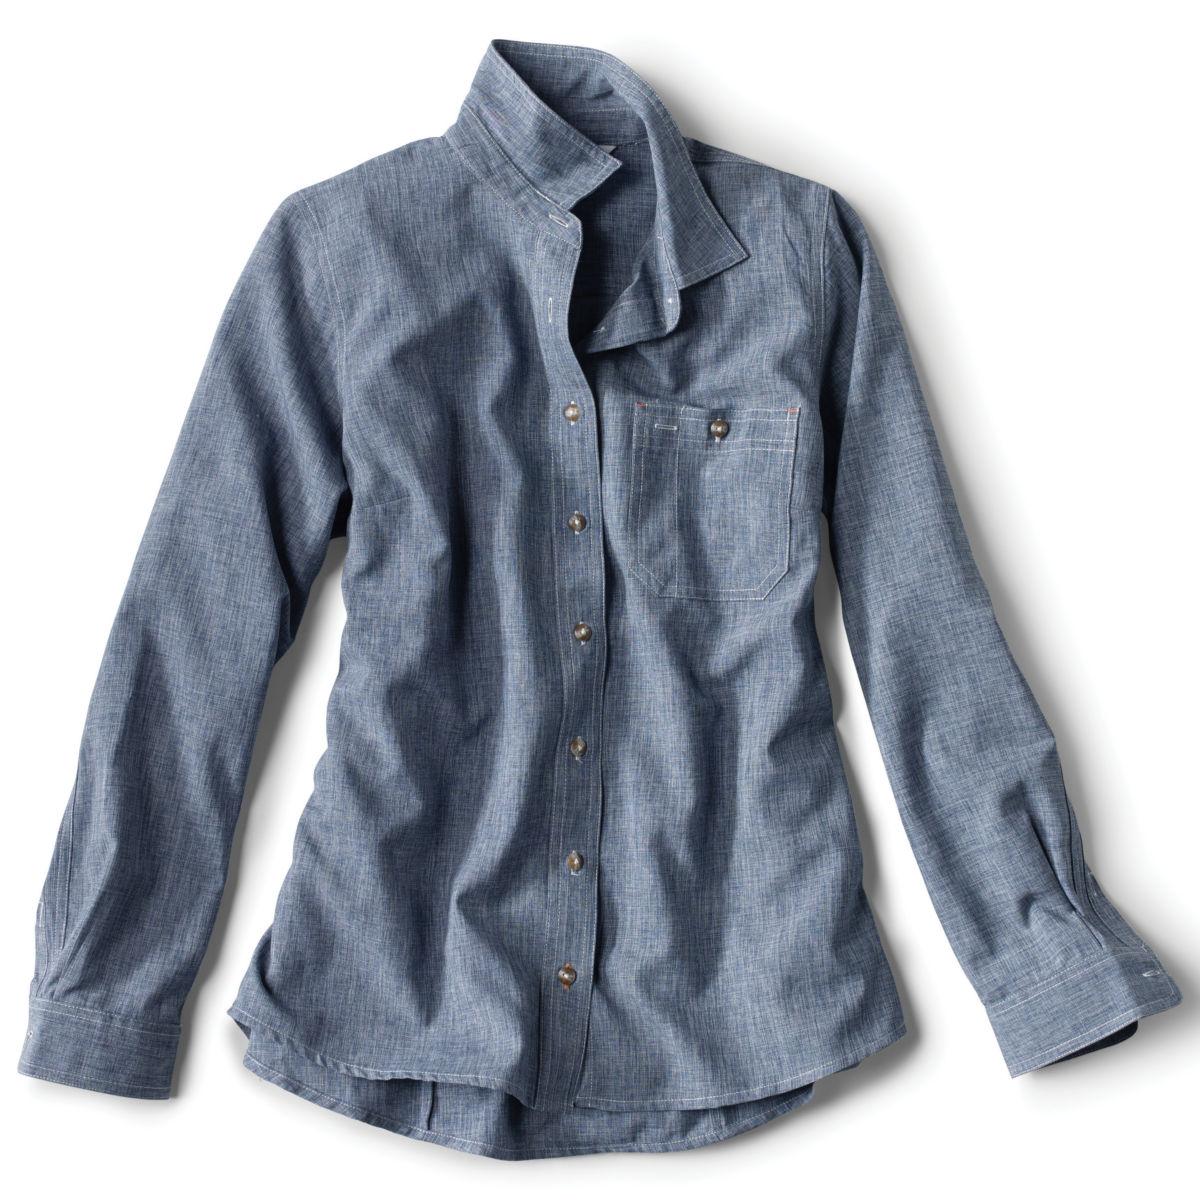 Women's Tech Chambray Work Shirt - BLUE CHAMBRAYimage number 0